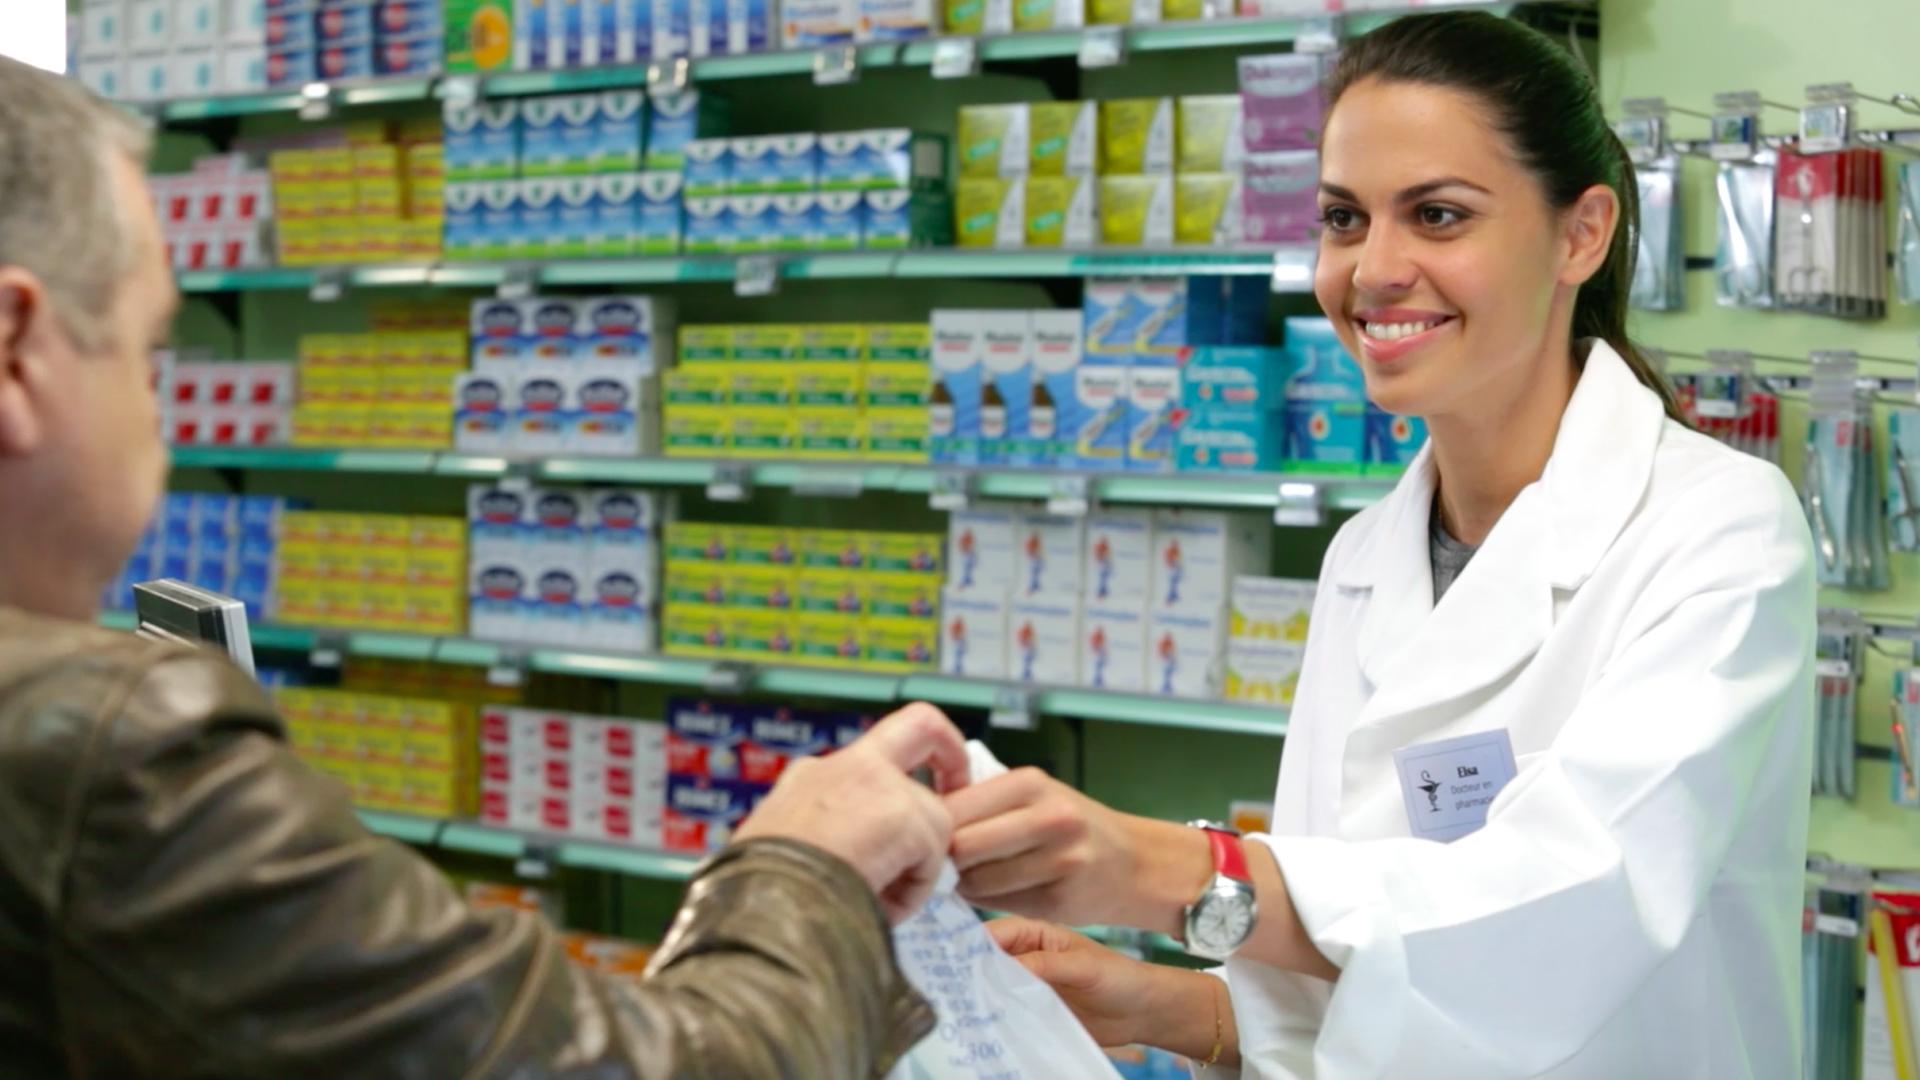 Le Pharmacien de demain - evolution metier